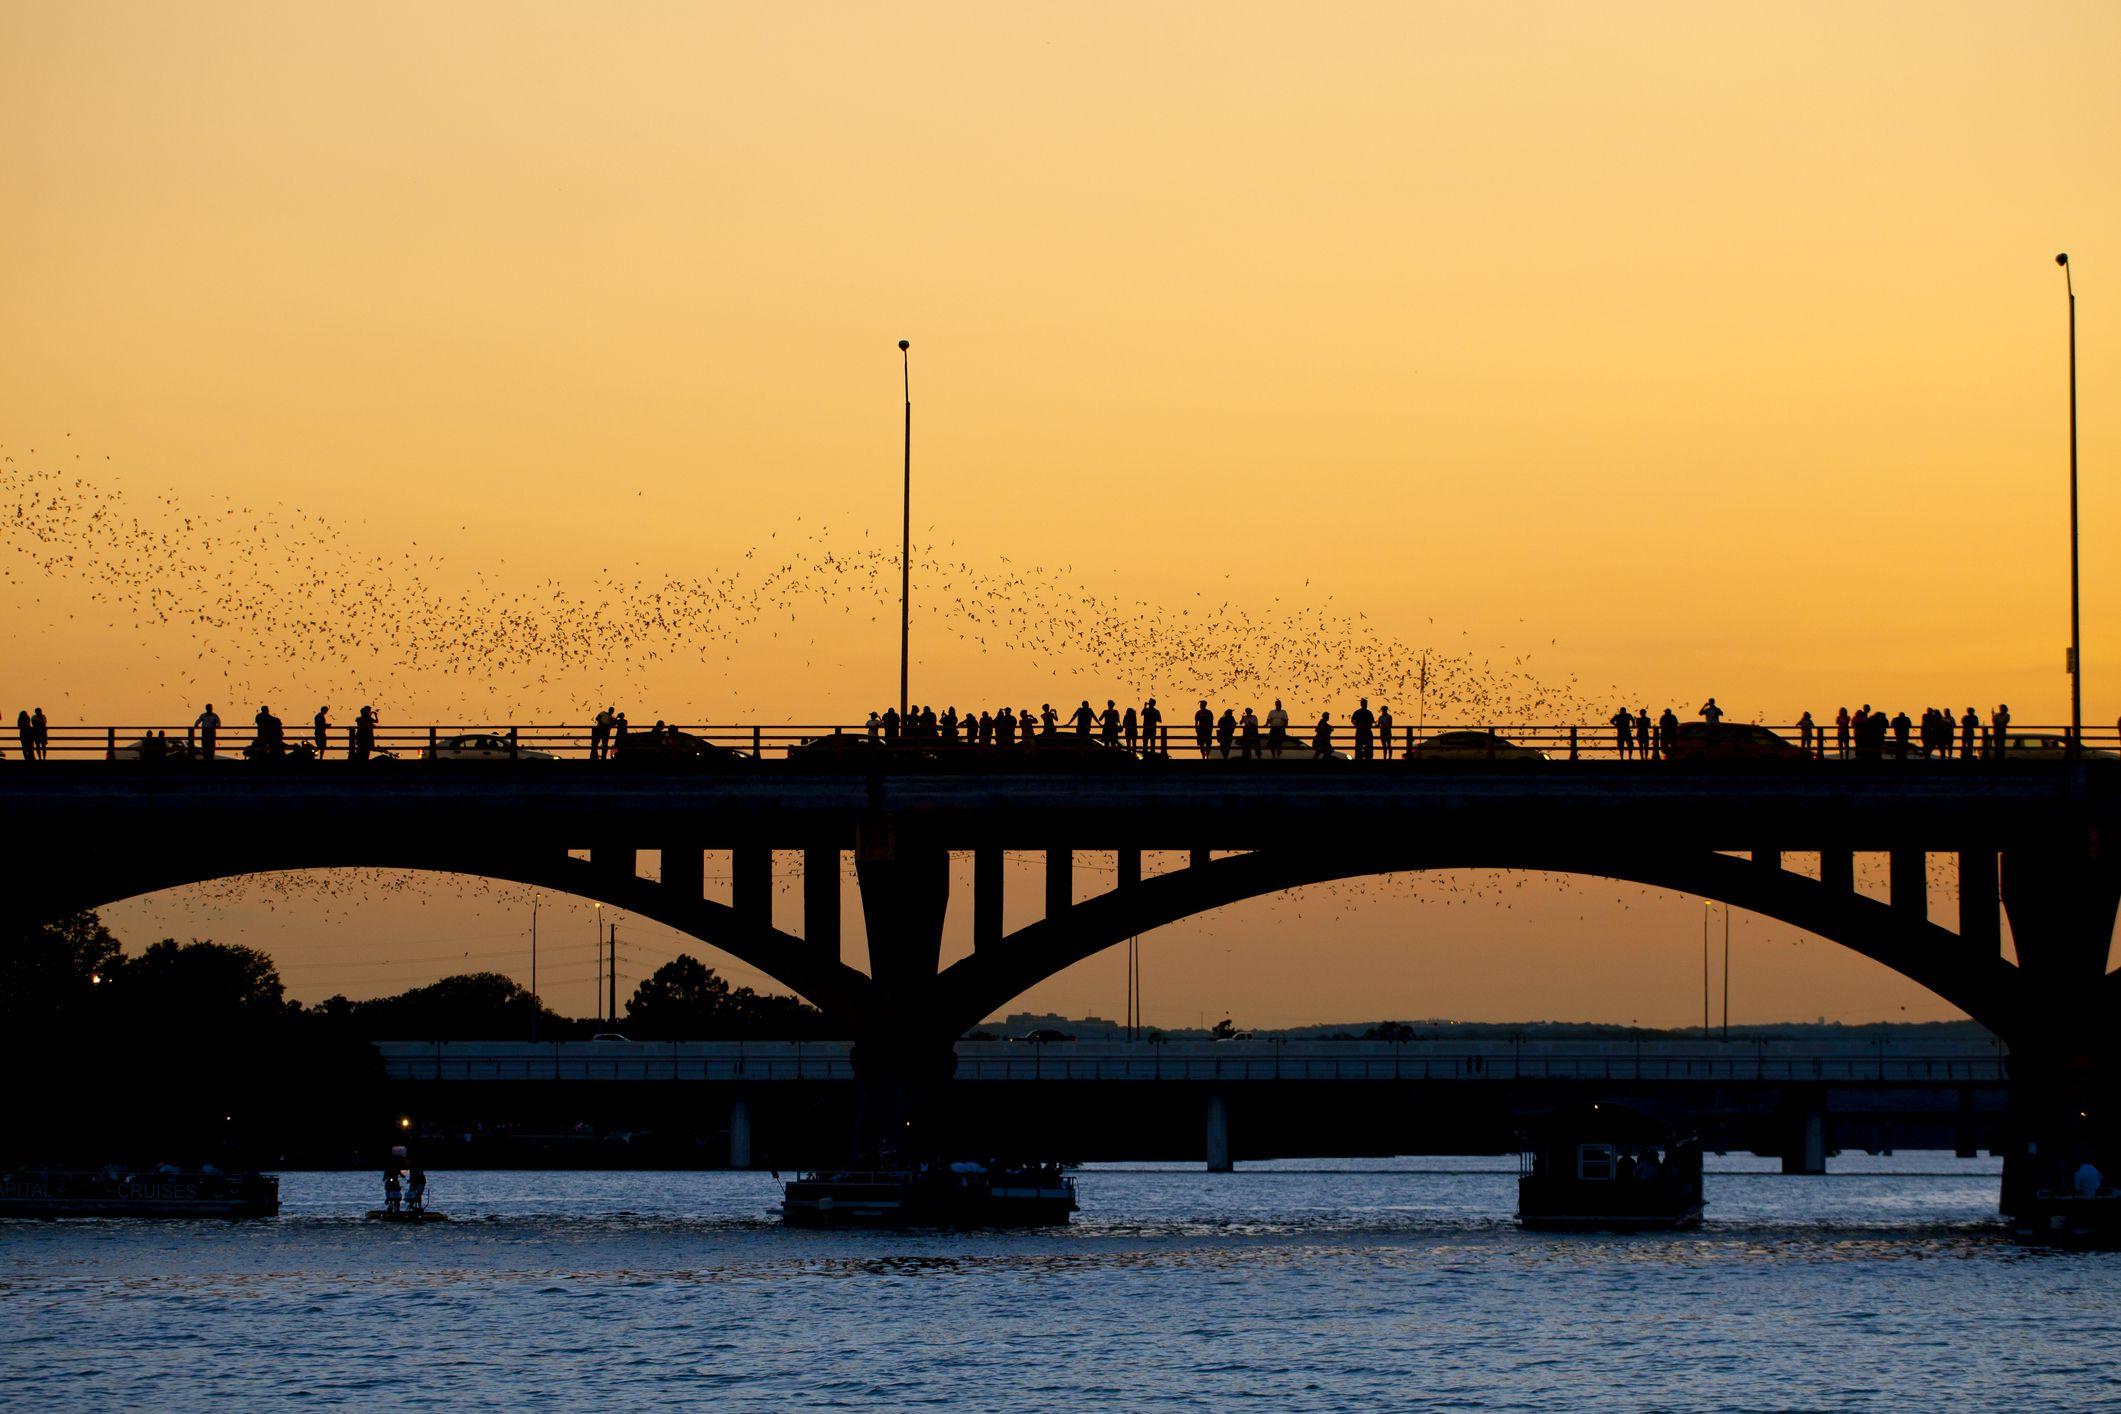 Some bats go fishing.